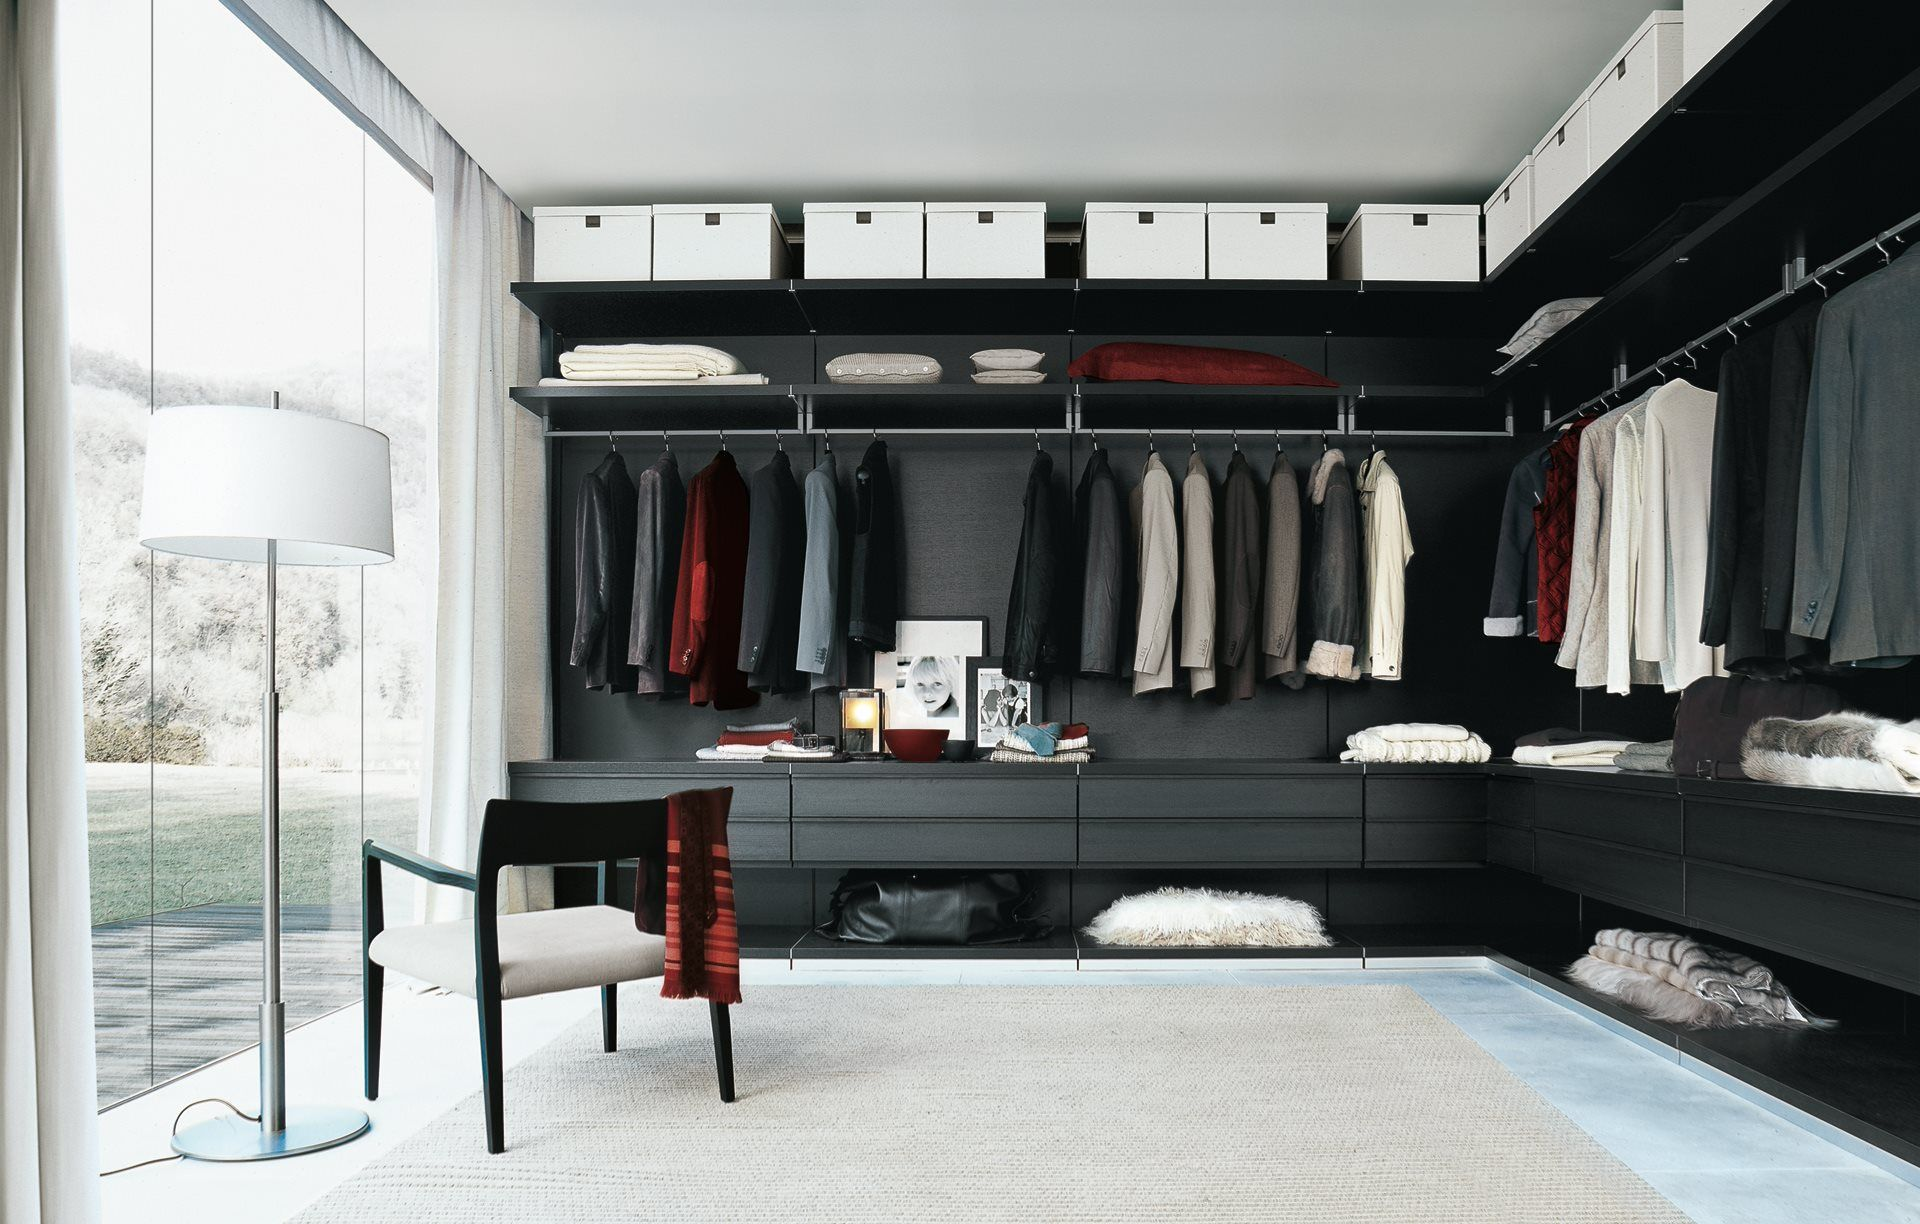 Pin Di Cucine Composit Su Composit Walk In Wardrobe Extra Stile Contemporaneo Arredamento Armadio